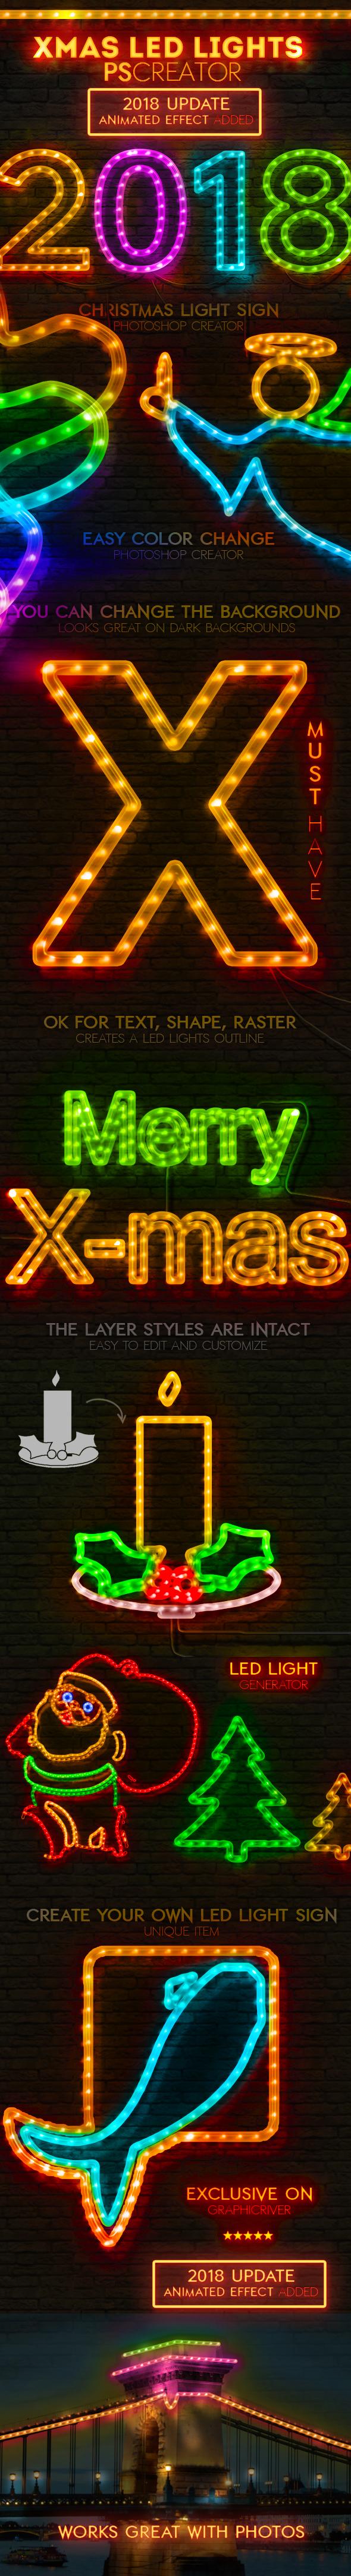 neon light graphics designs